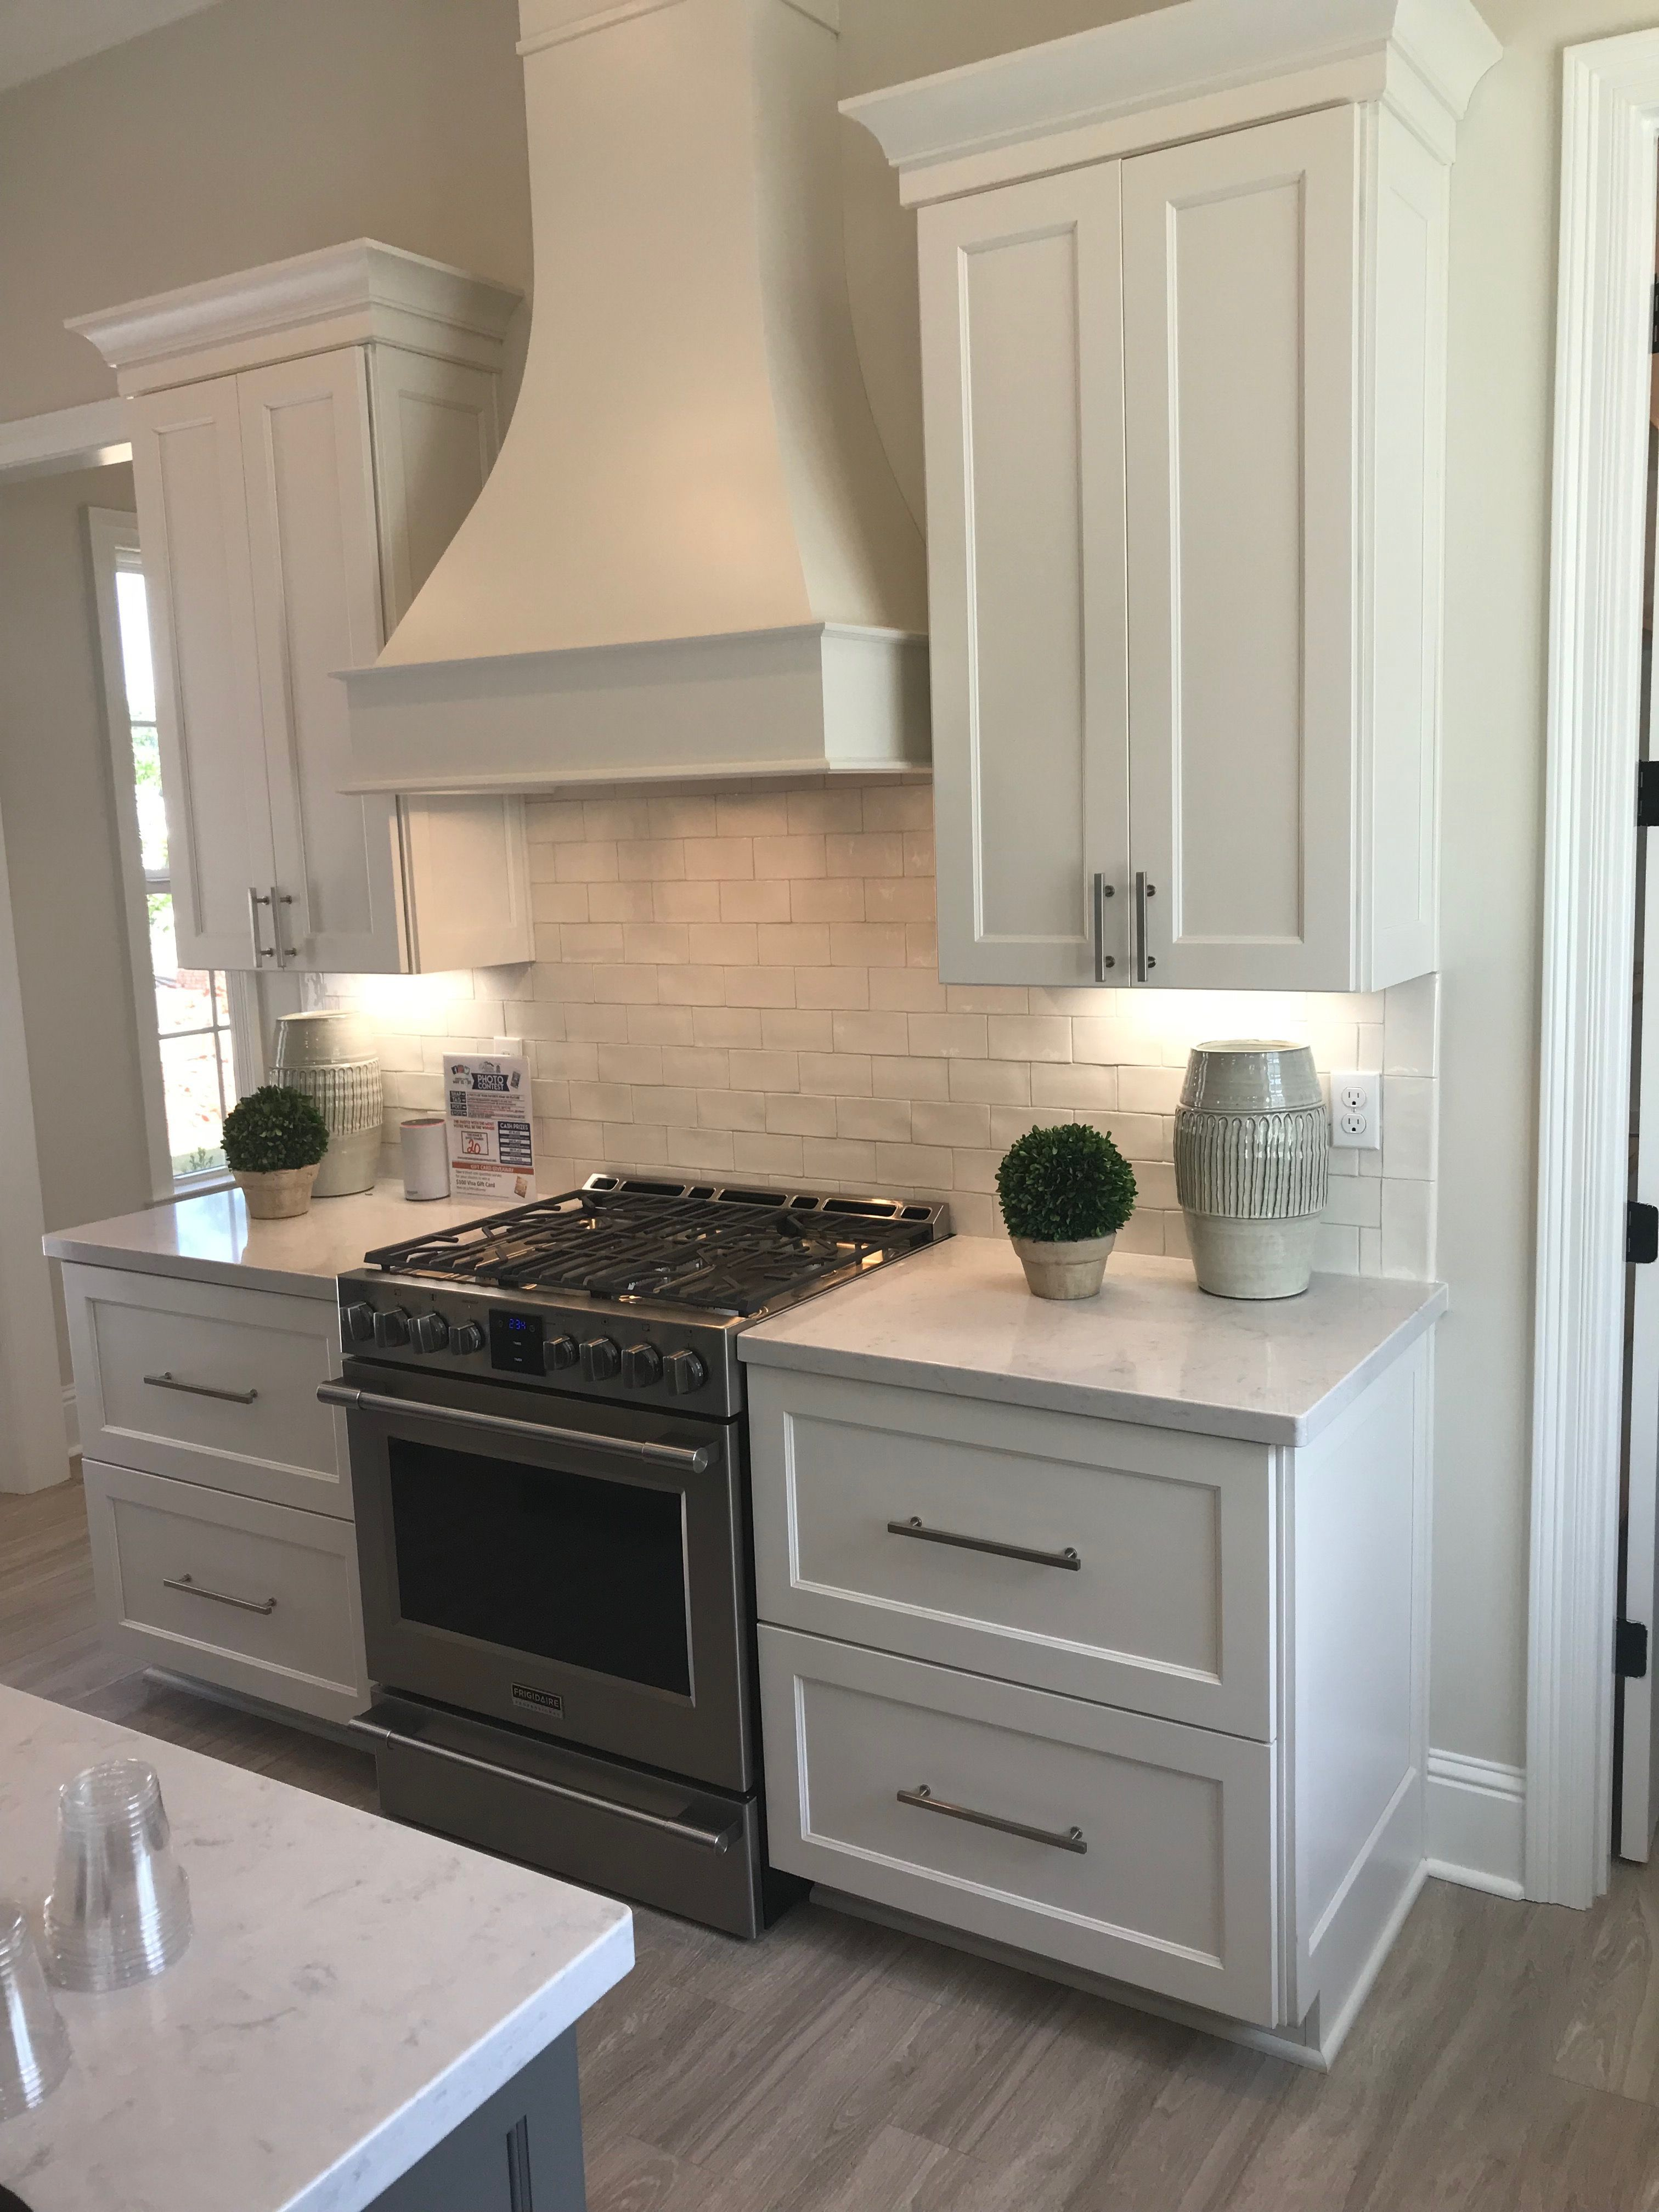 Kitchen Cabinets, Backsplash Range Hood Option #Kitchencabinetsbacksplash